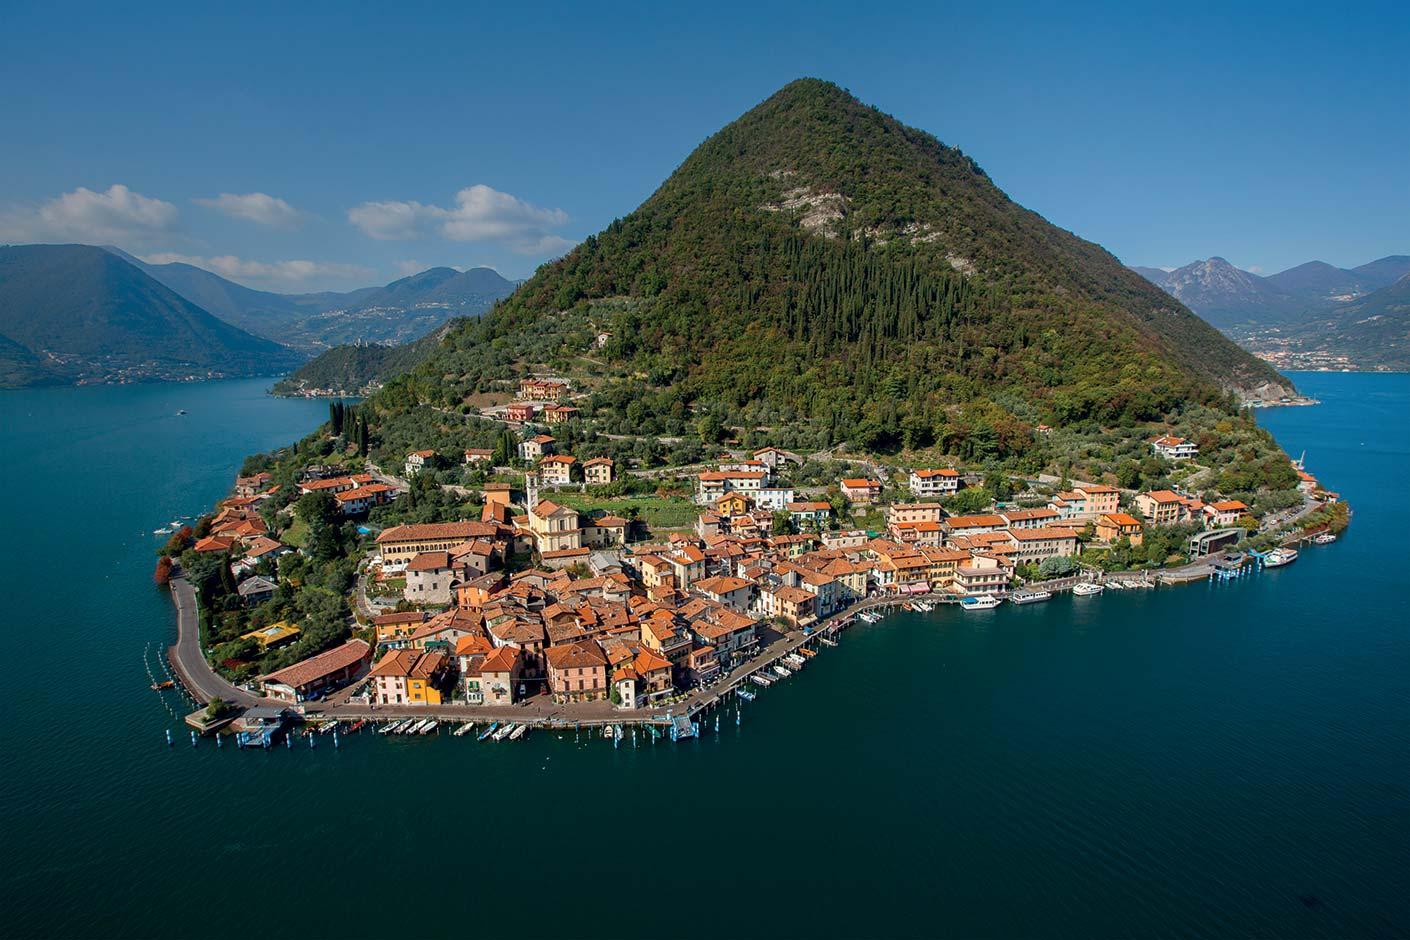 montisola-el-llac-mes-gran-illa-a-europa-secret-world